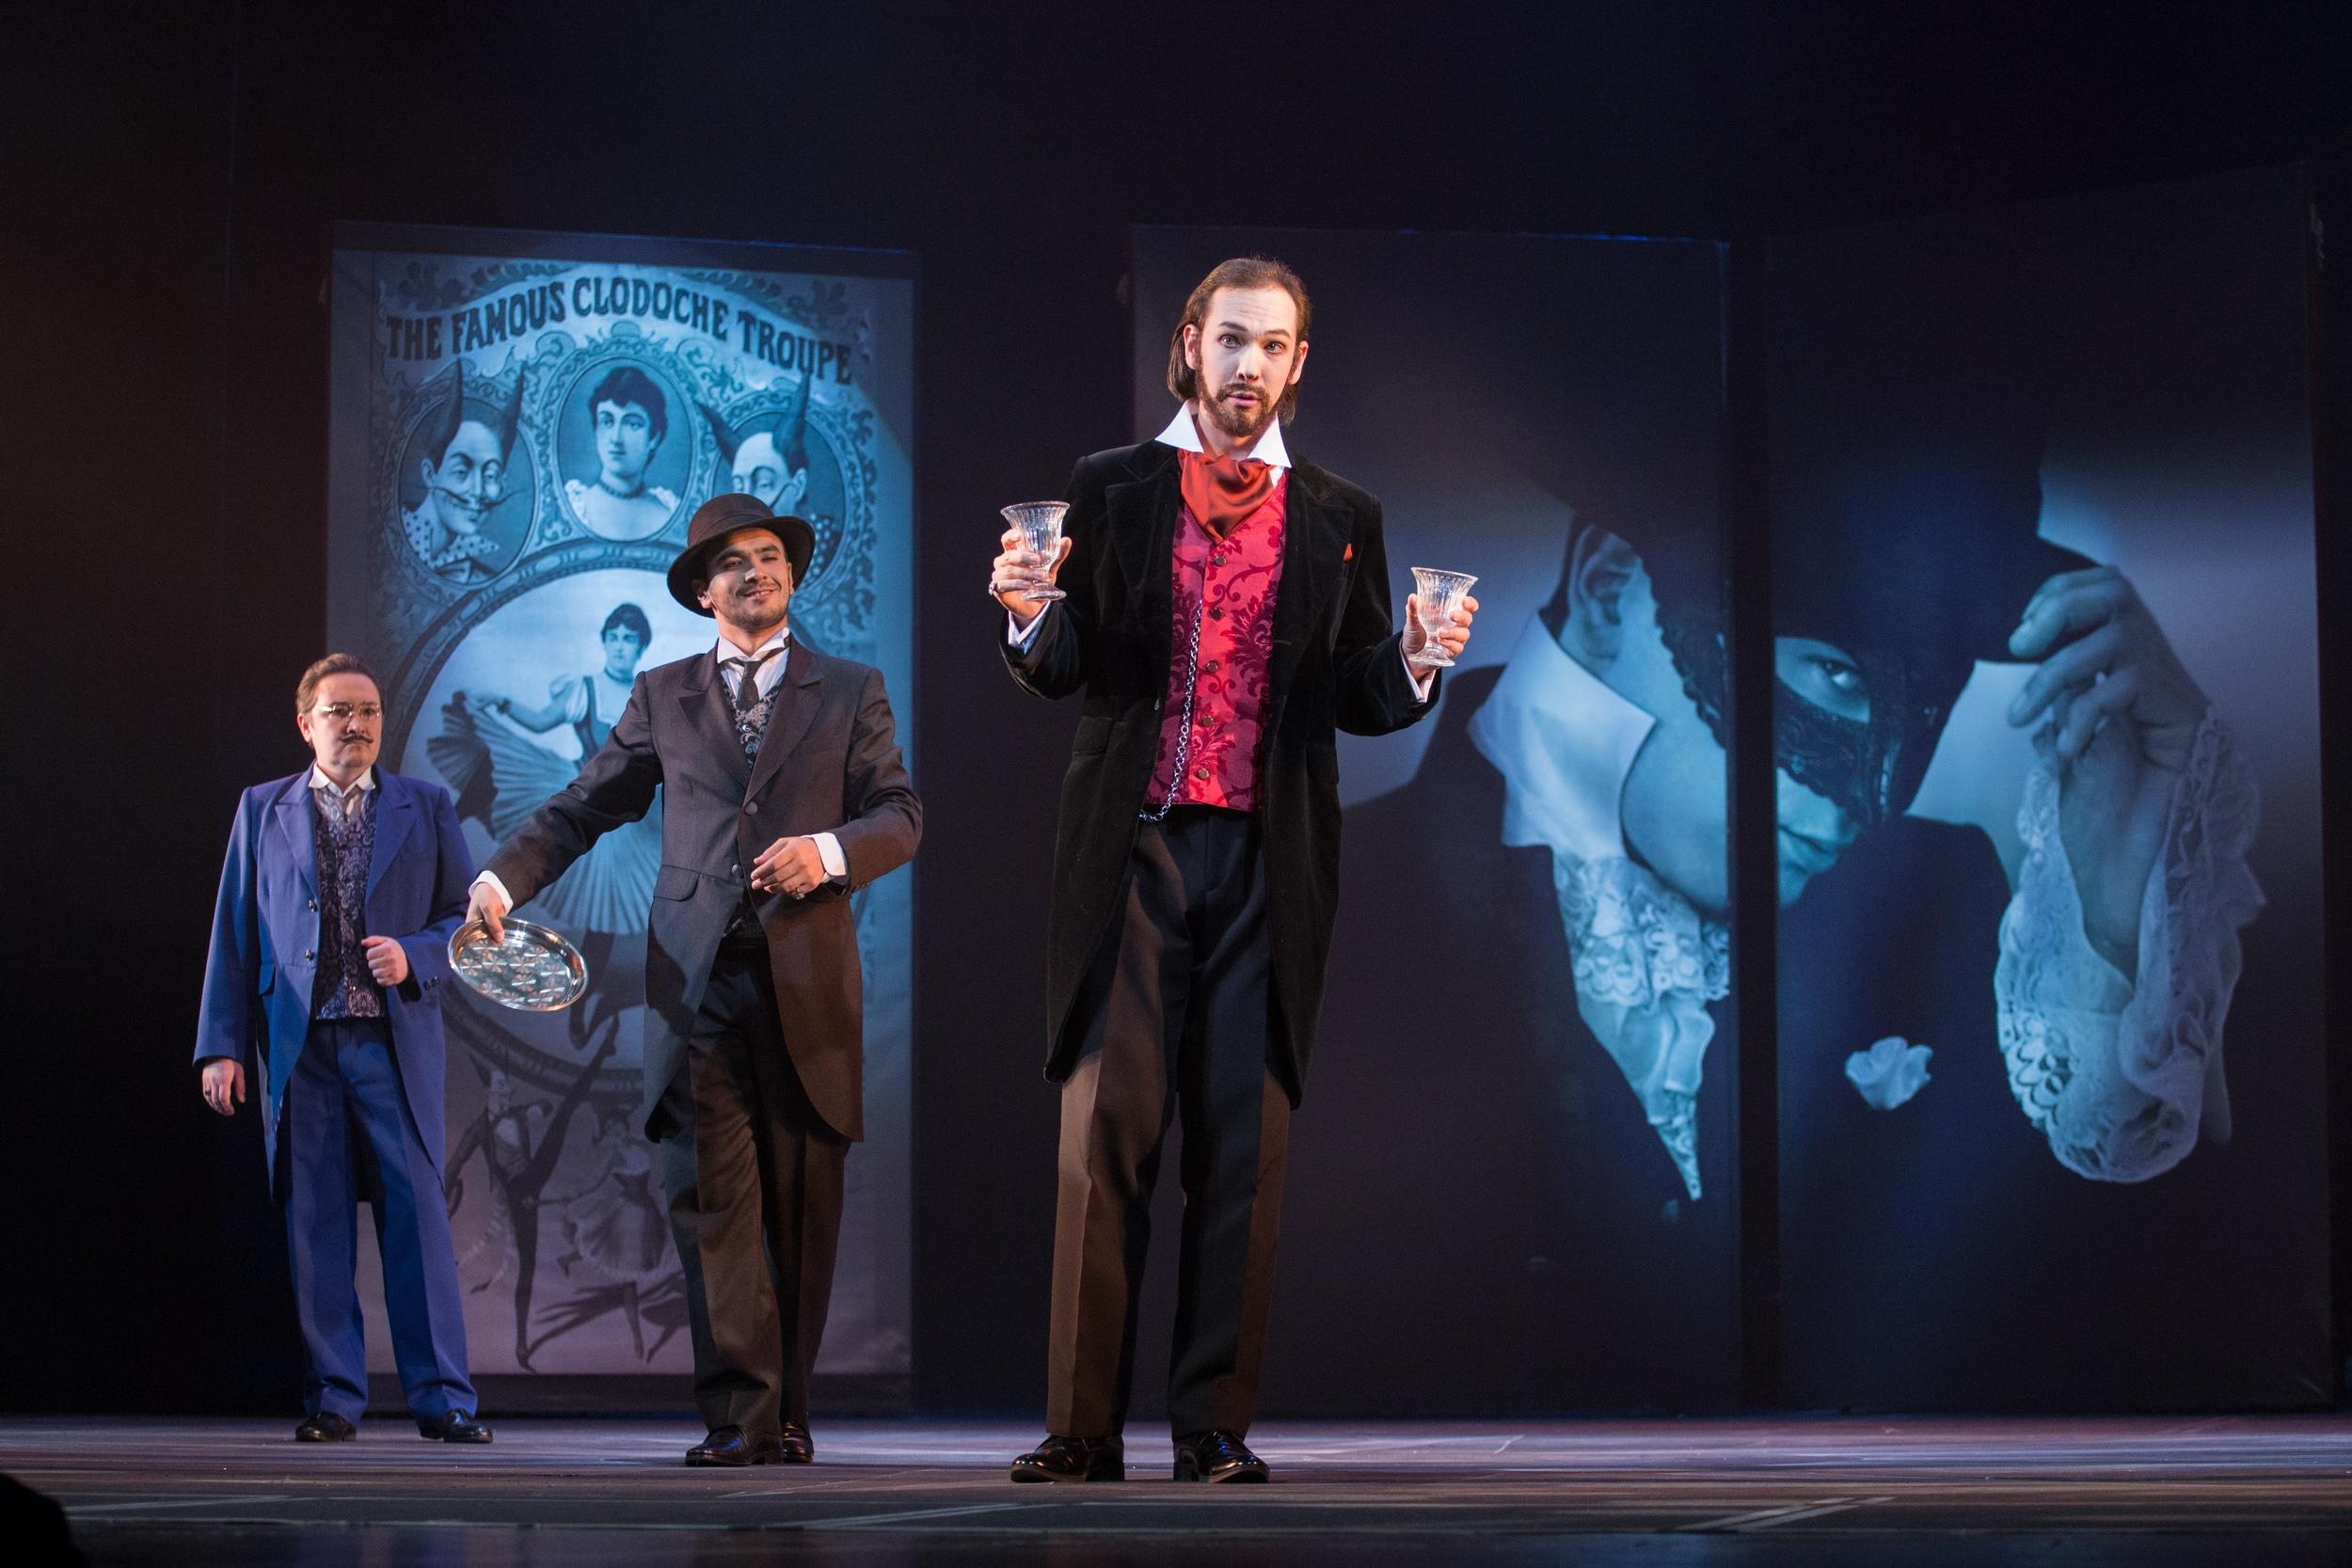 Директор цирка, Пуассон и барон де Кревельяк. Фото Виталия Голубева